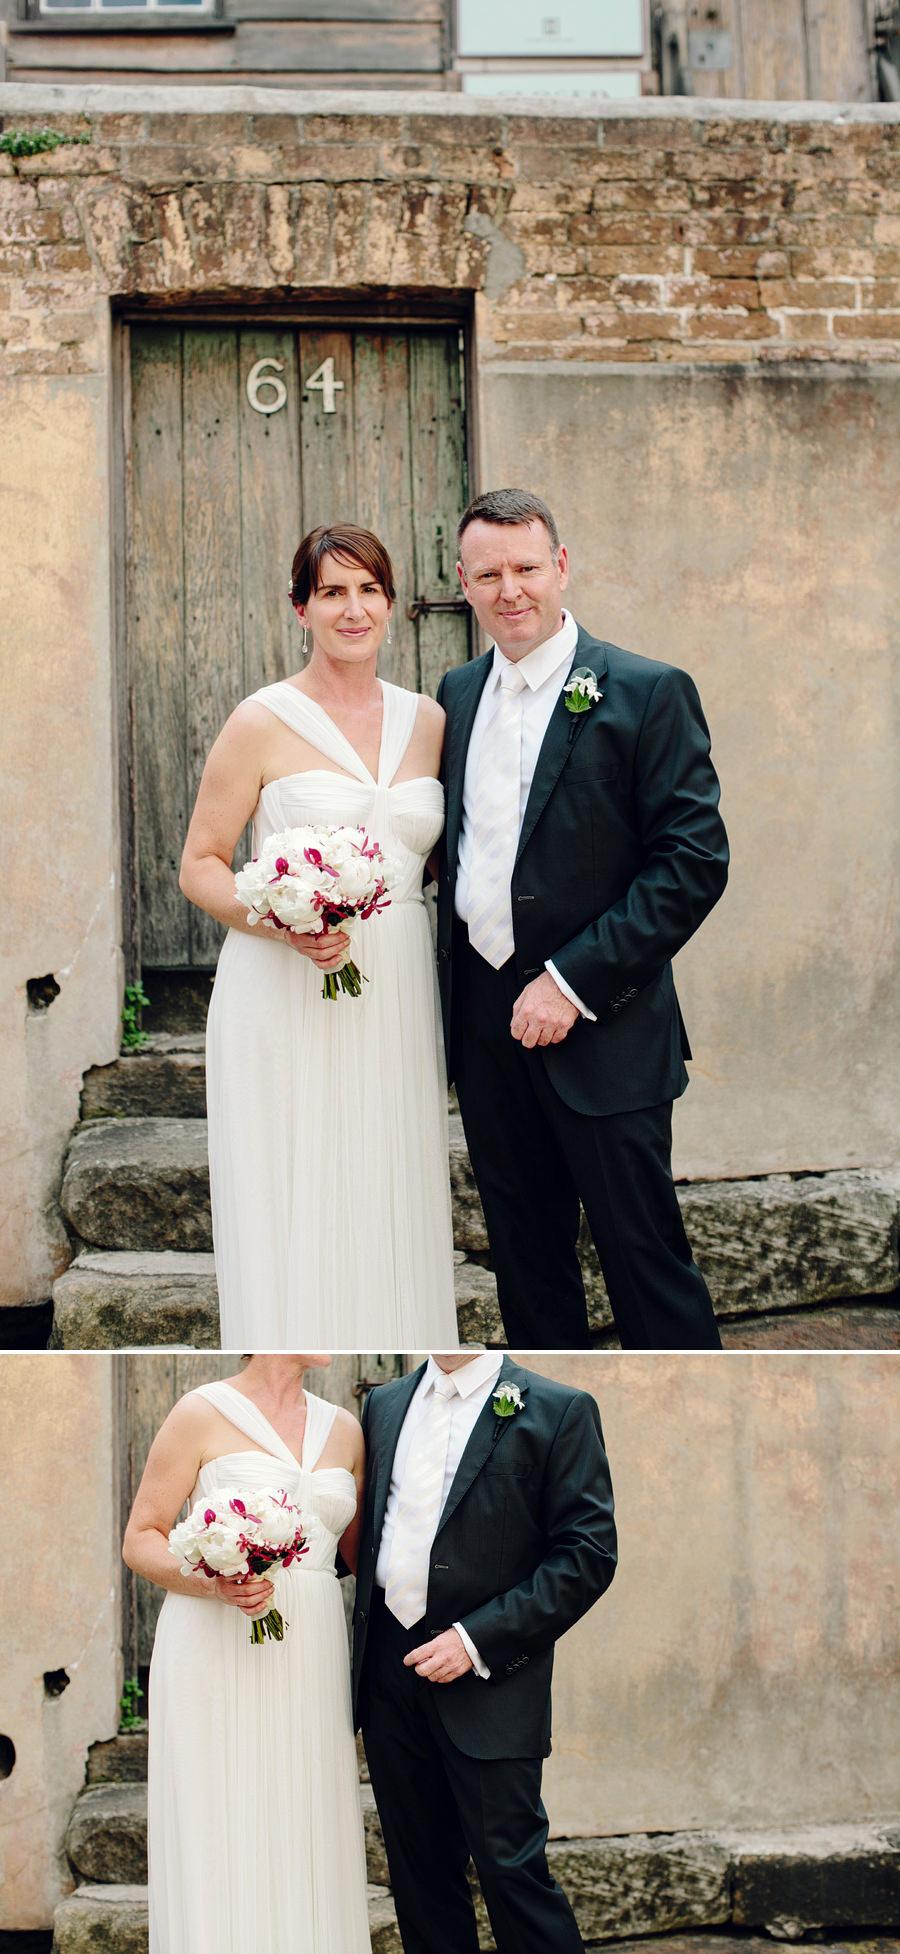 The Rocks Wedding Photography: Julie & John